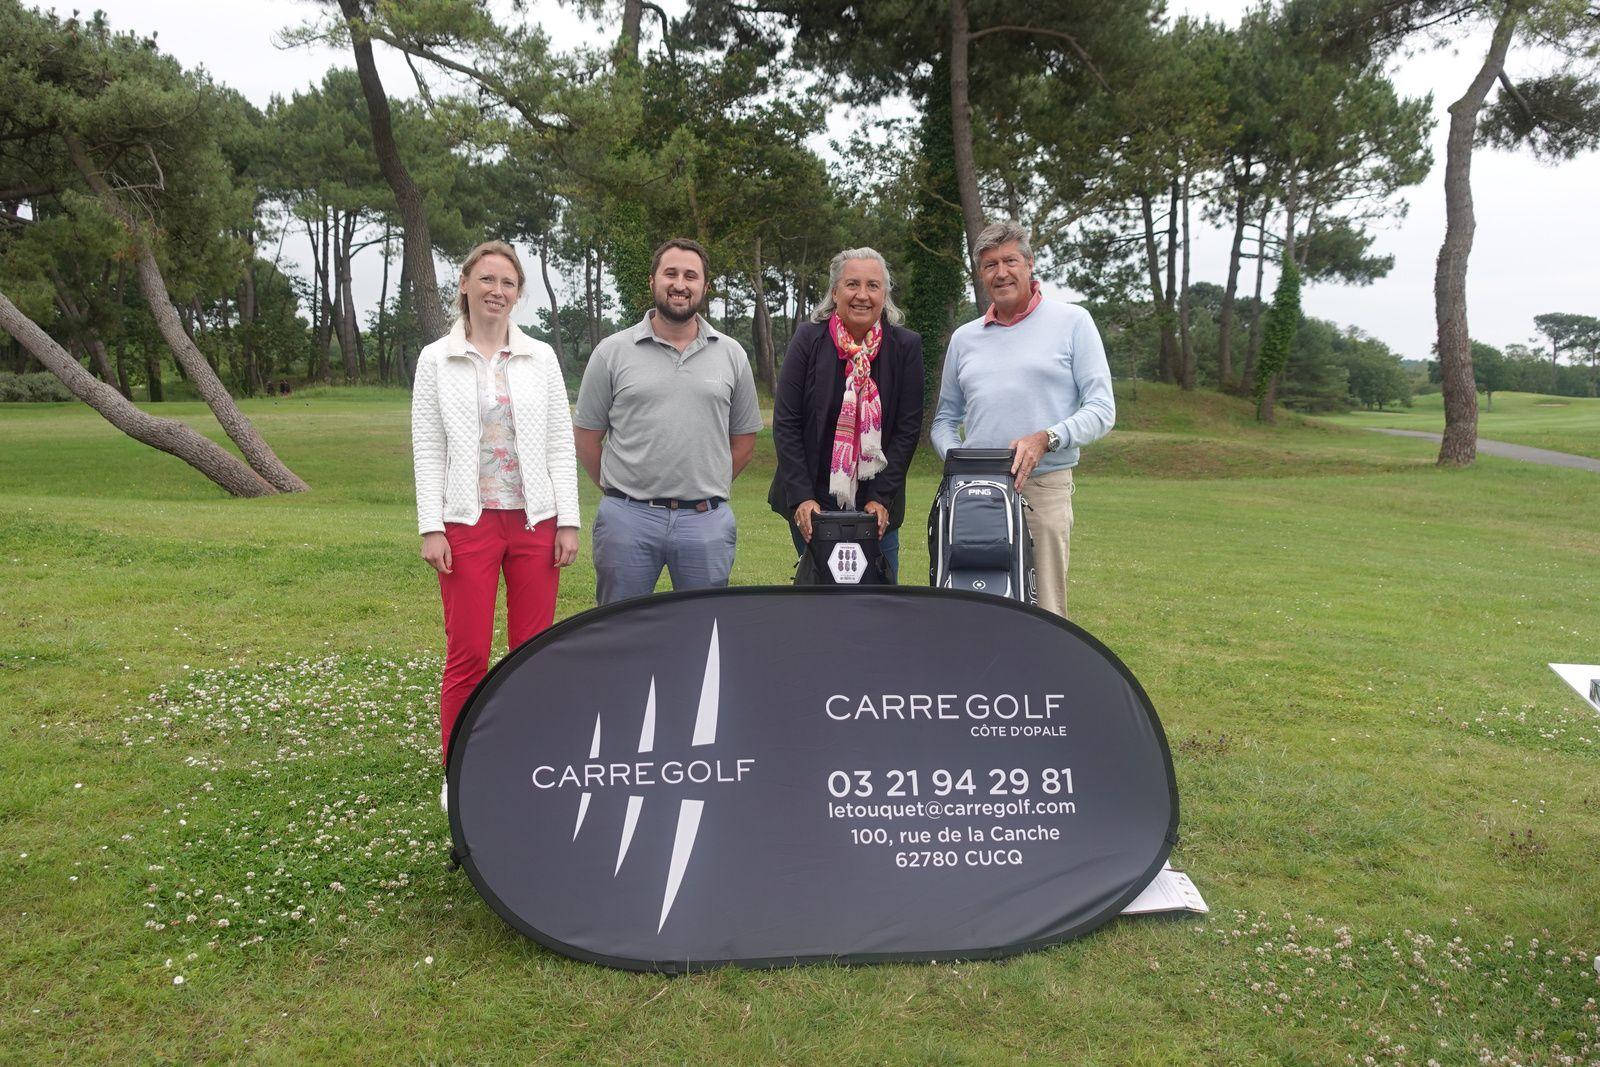 Coupe CARRE Golf: Mercredi 14 juillet 2021